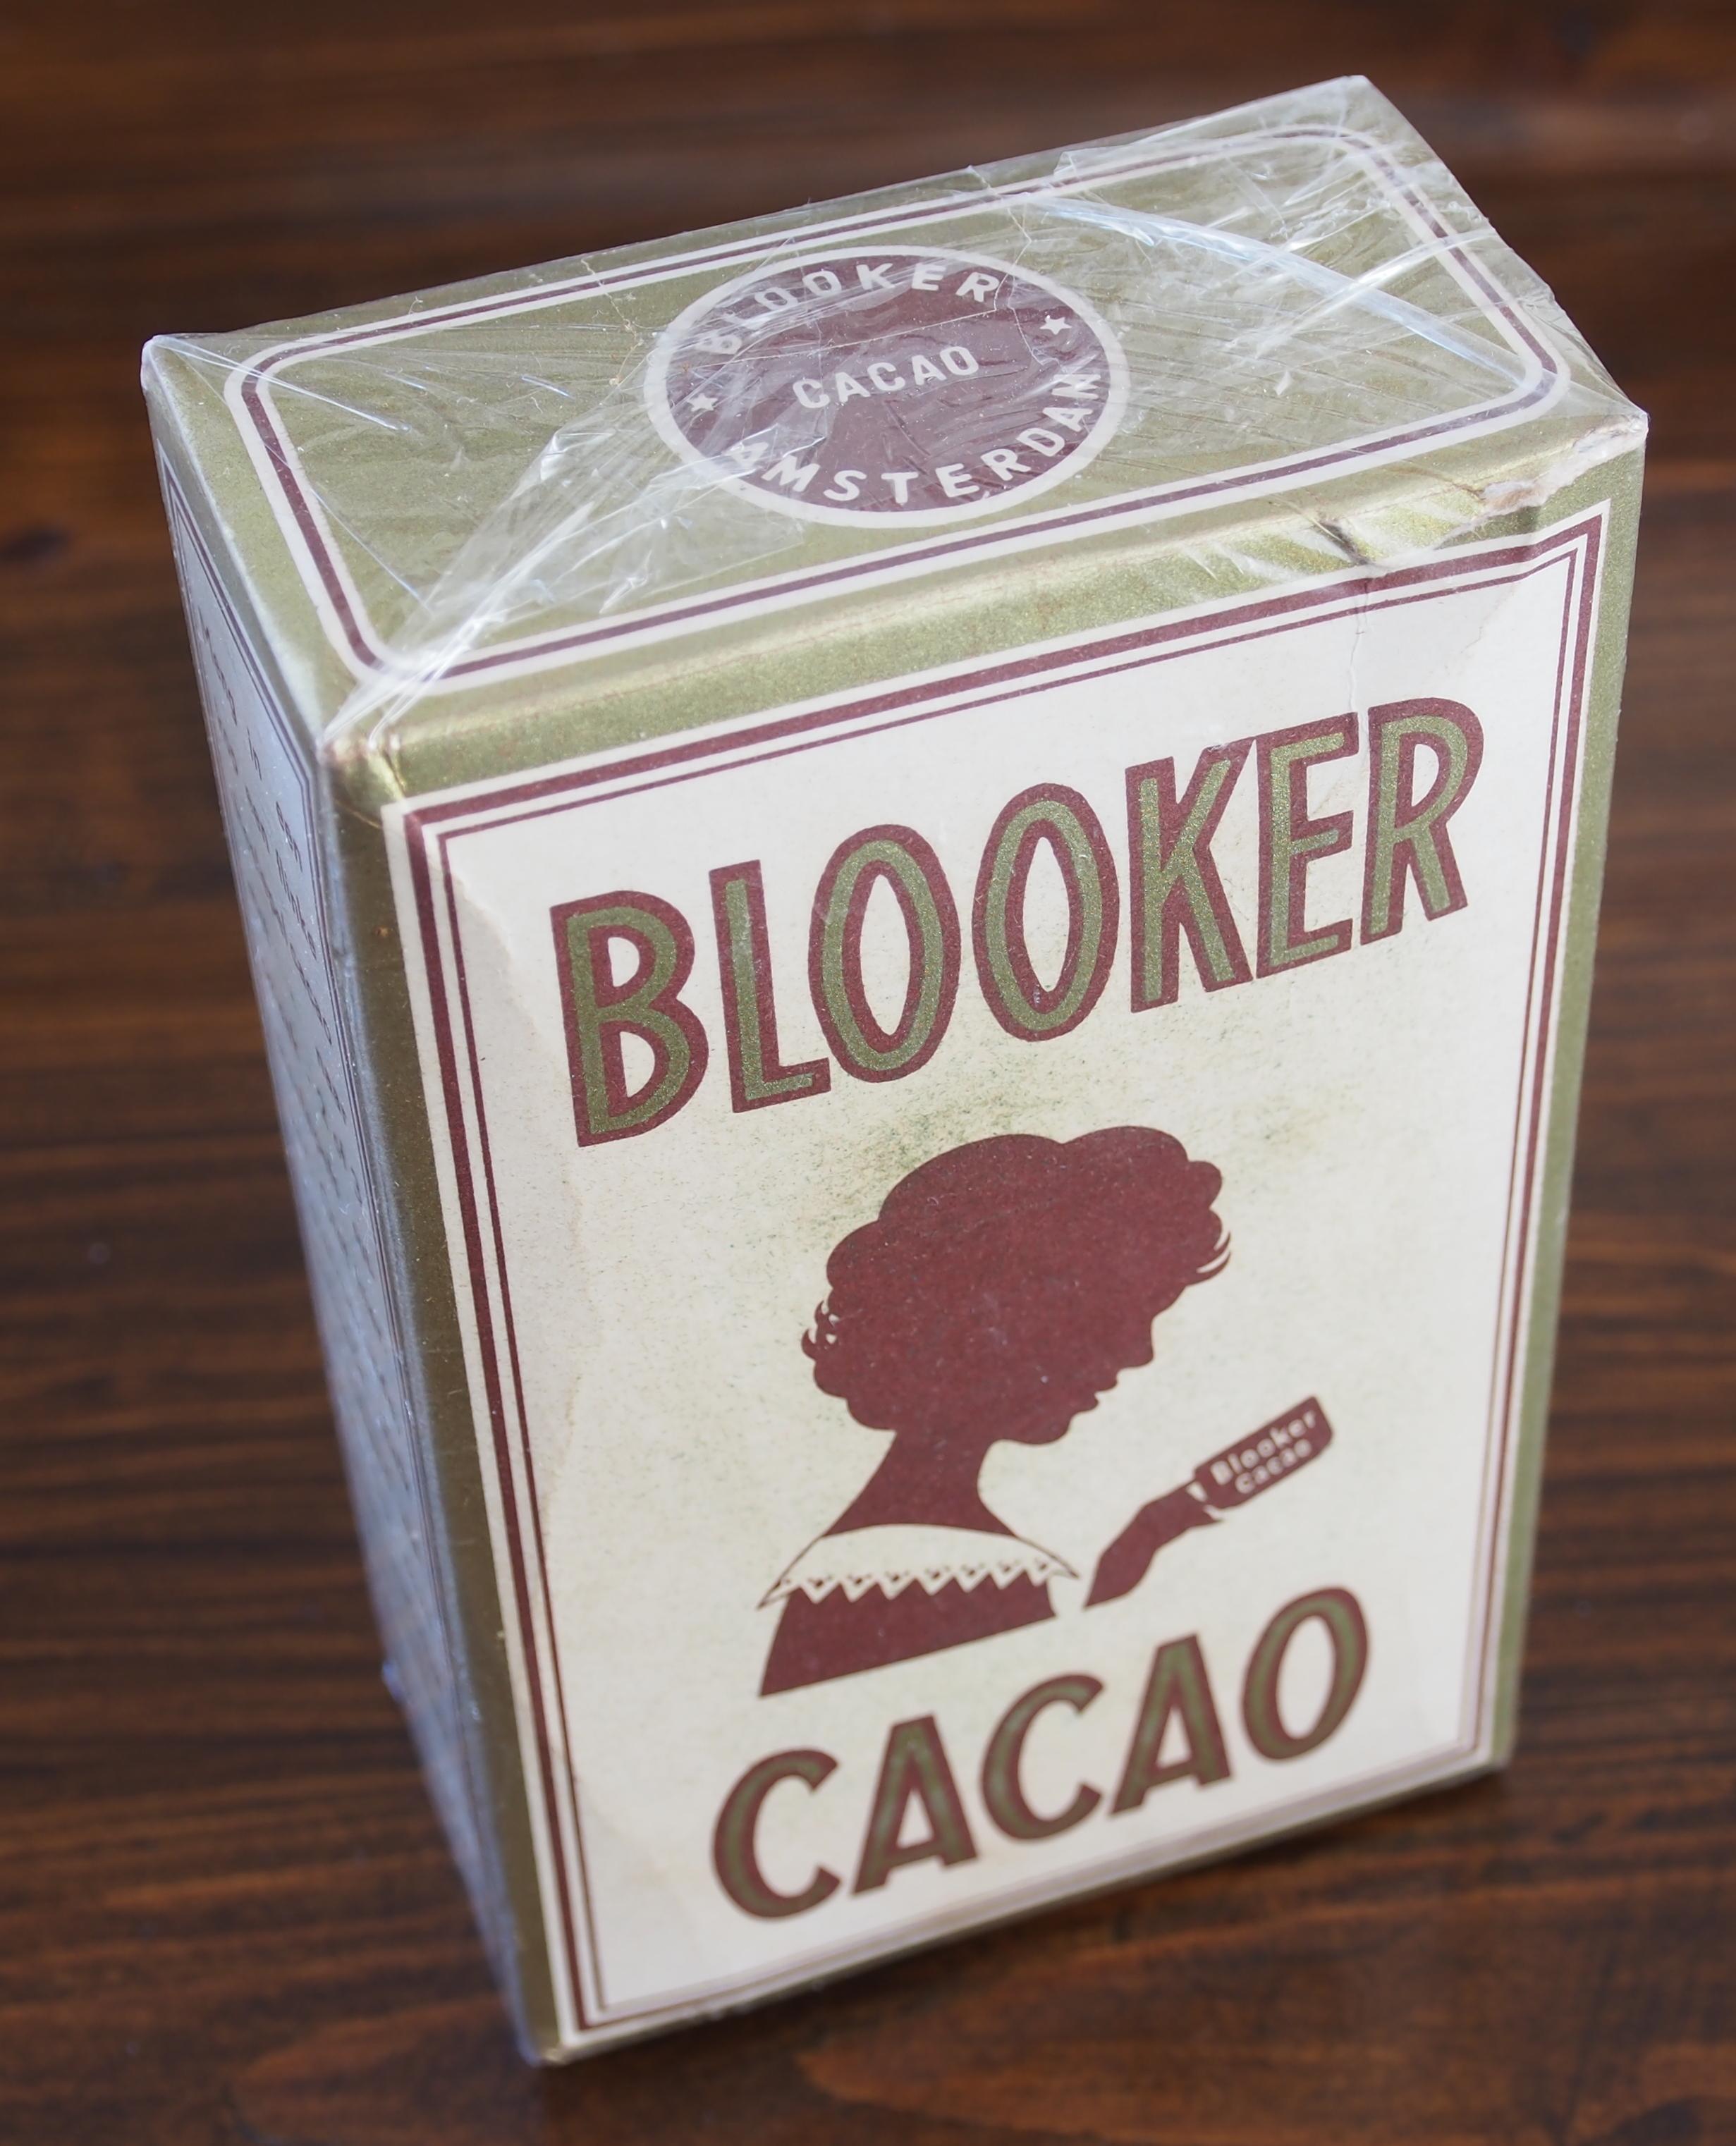 Blooker_Cacao_poeder_pakje_pic2.JPG